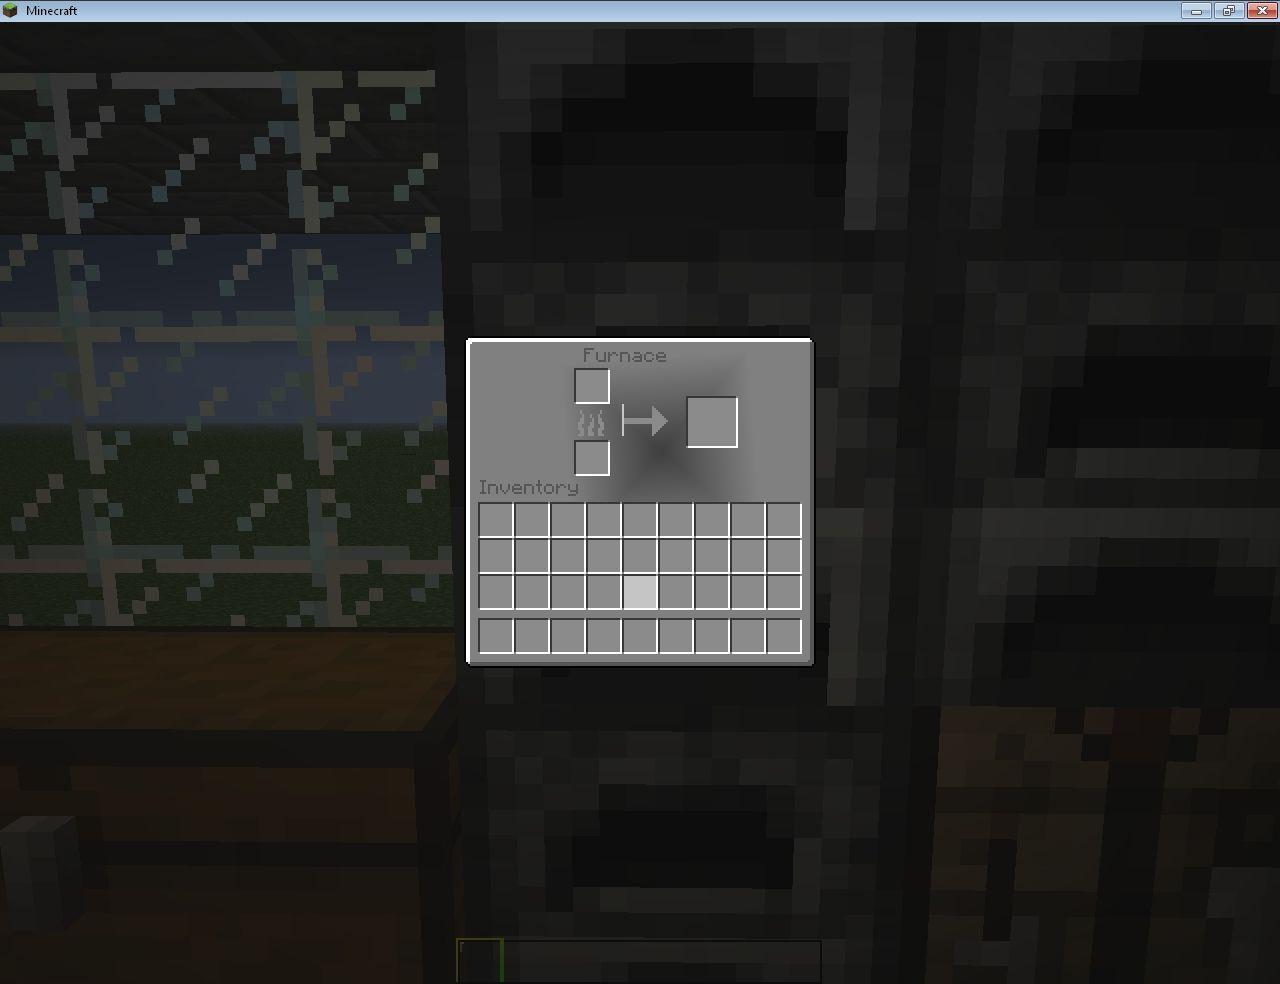 the furnace GUI